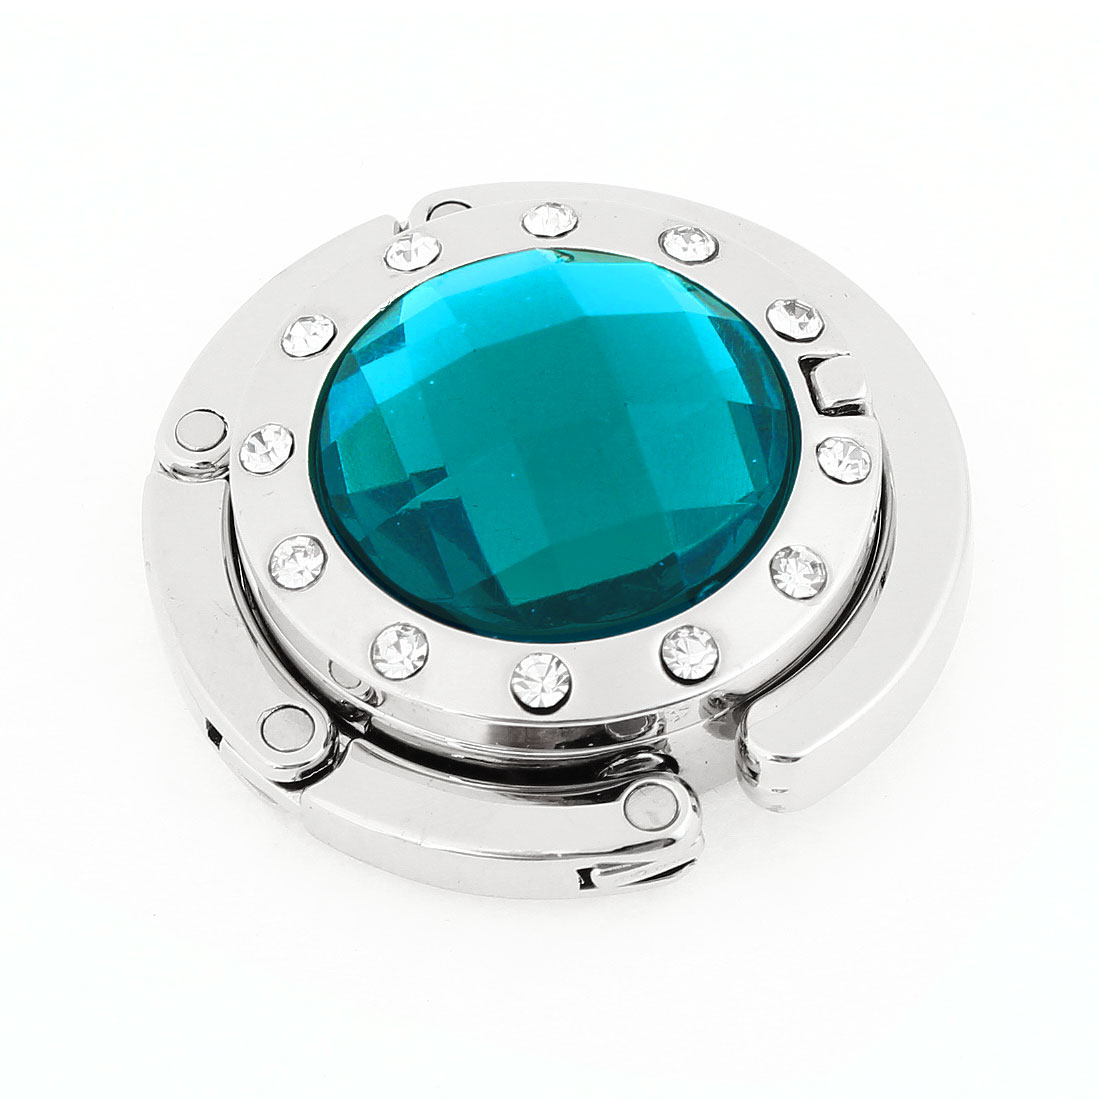 Ladies Teal Blue Rhinestone Detailing Silver Tone Hook Handbag Hanger w Mirror